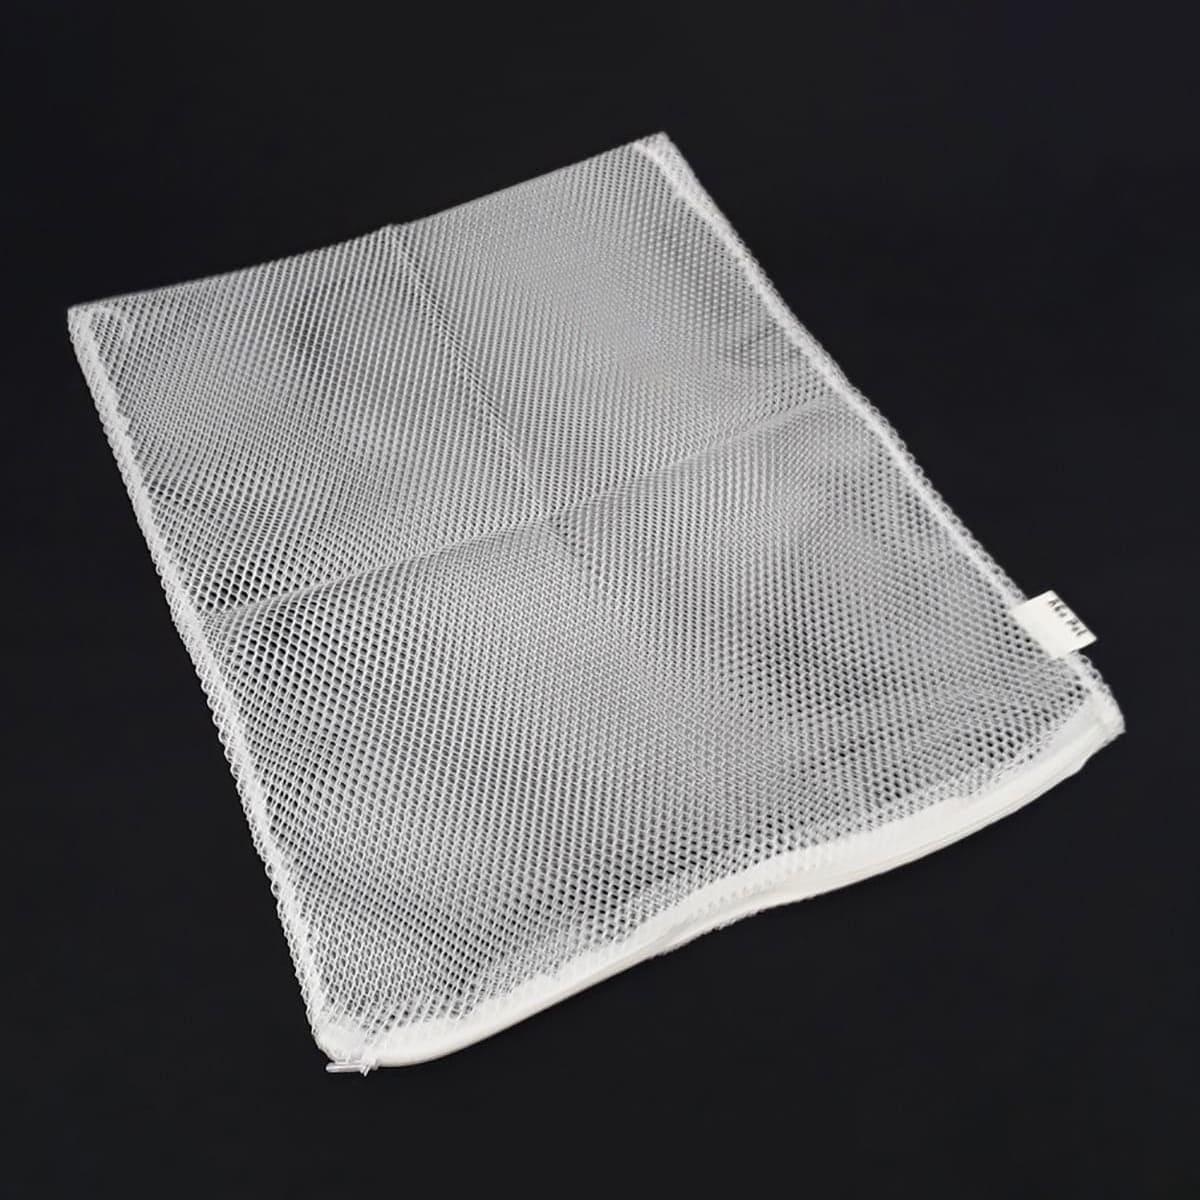 Bolsa para Material Filtrante N°1 WFish - 10X20 cm